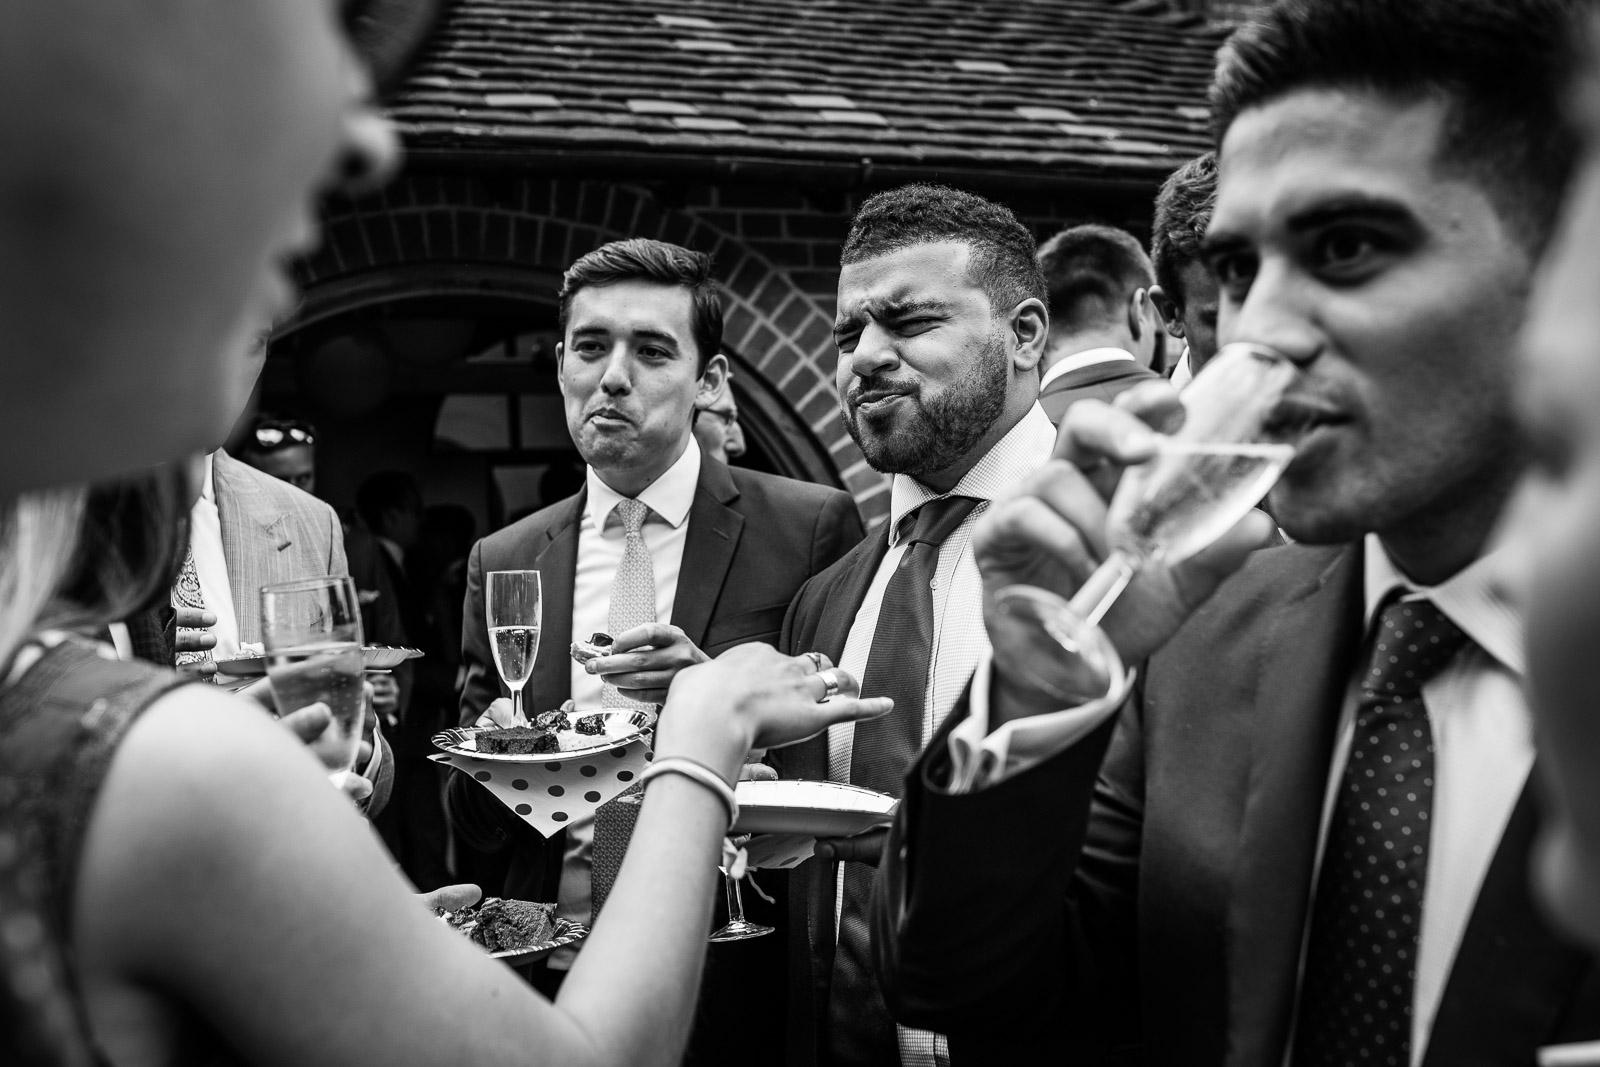 Hambledon House Wedding in Surrey